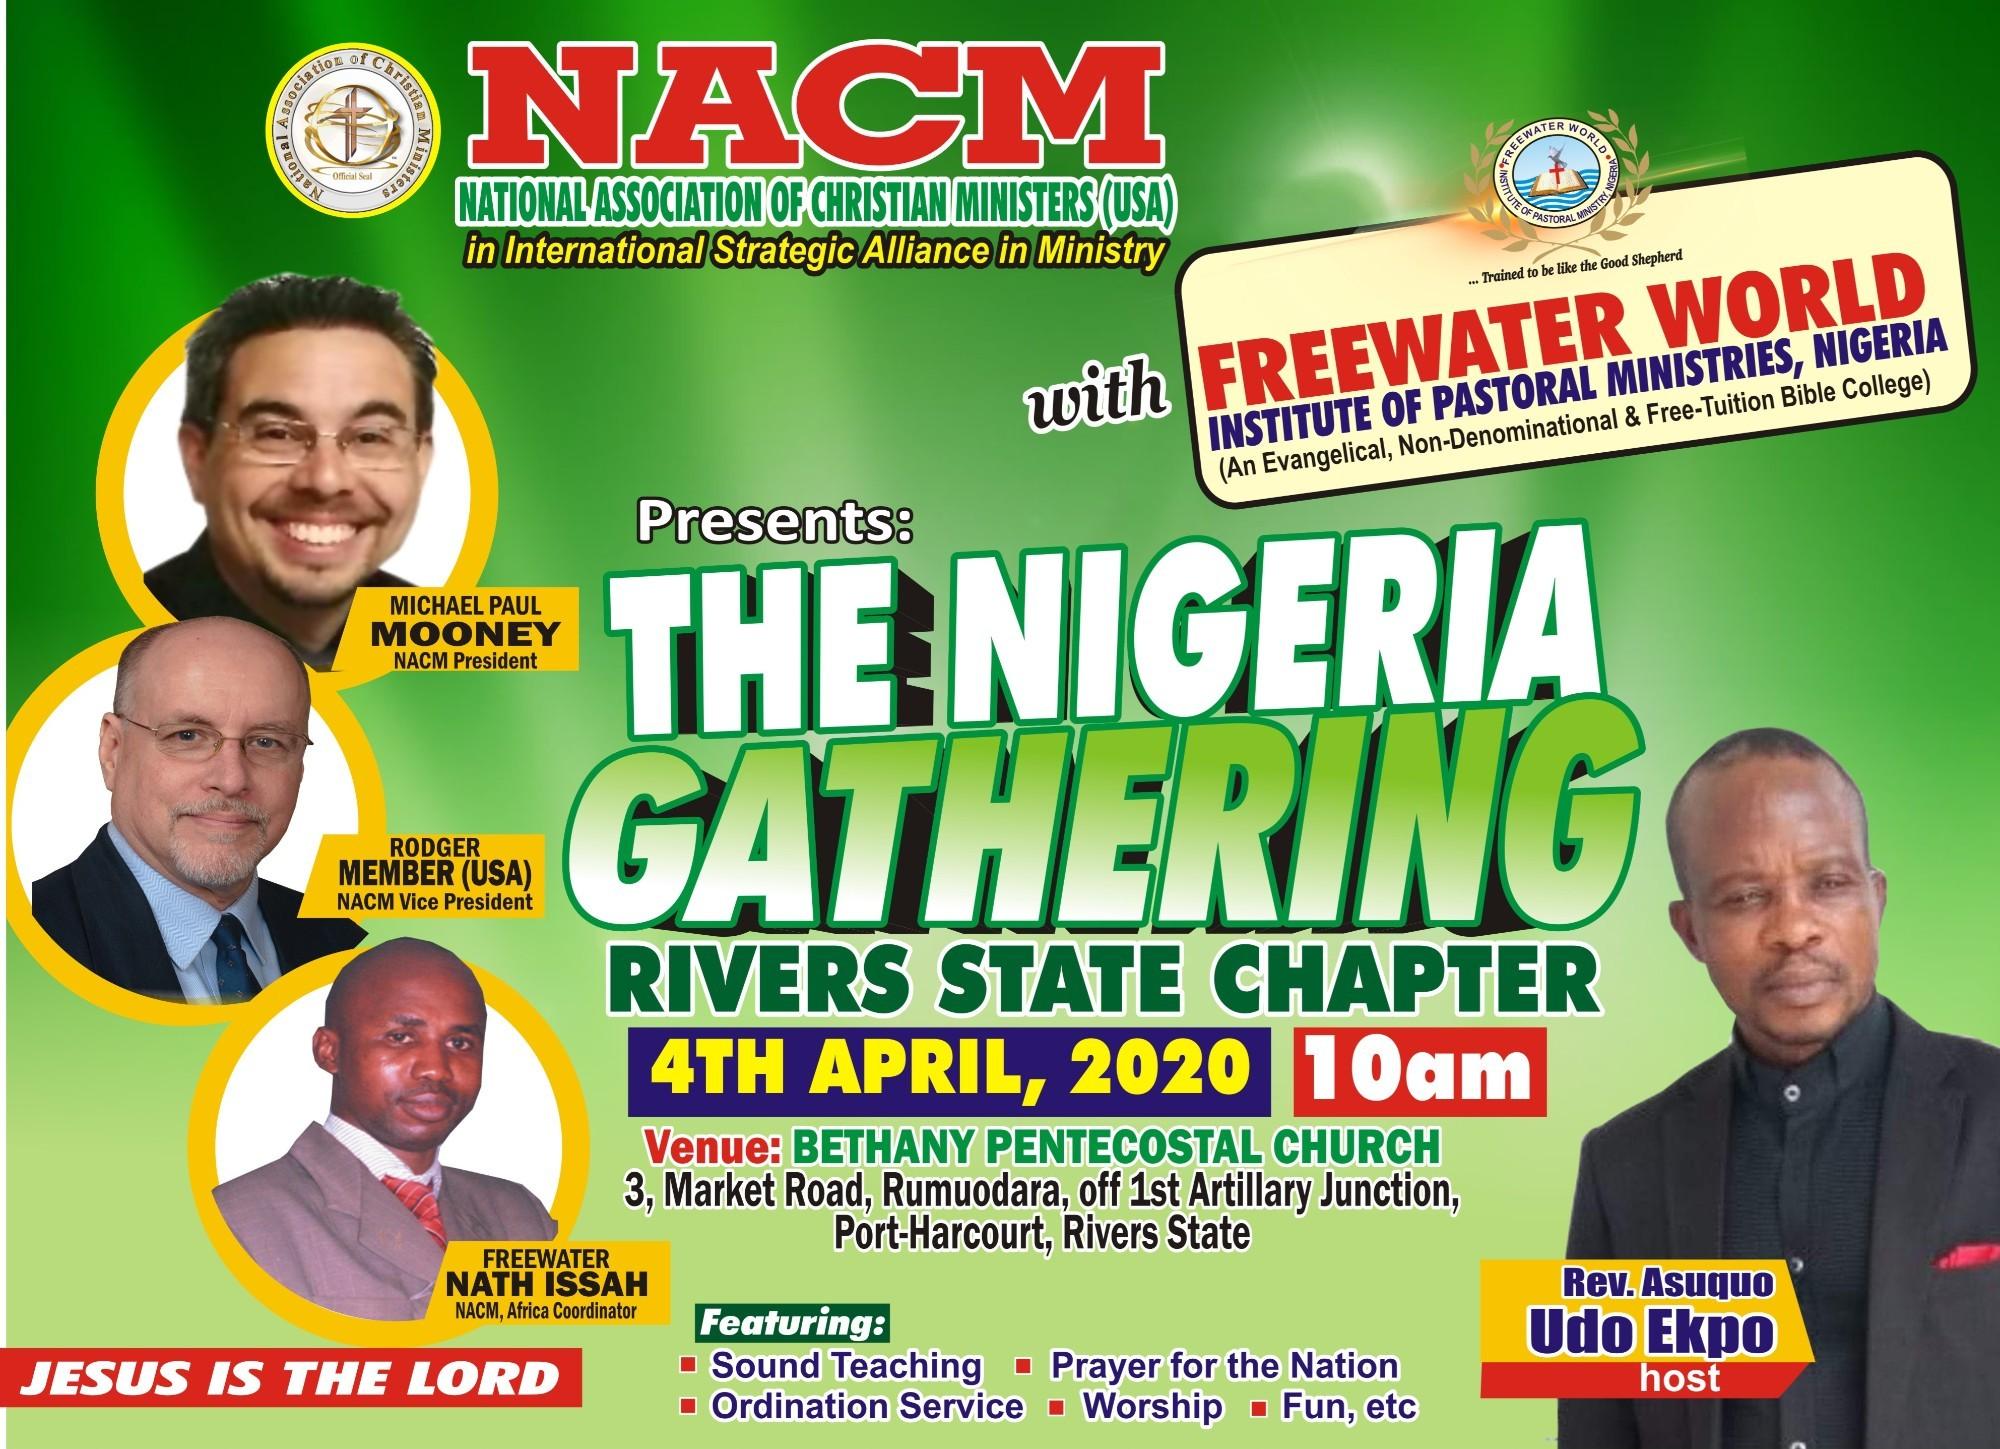 2 - NACM NIGERIA 2nd PORT HARCOURT Gathering APRIL 4th